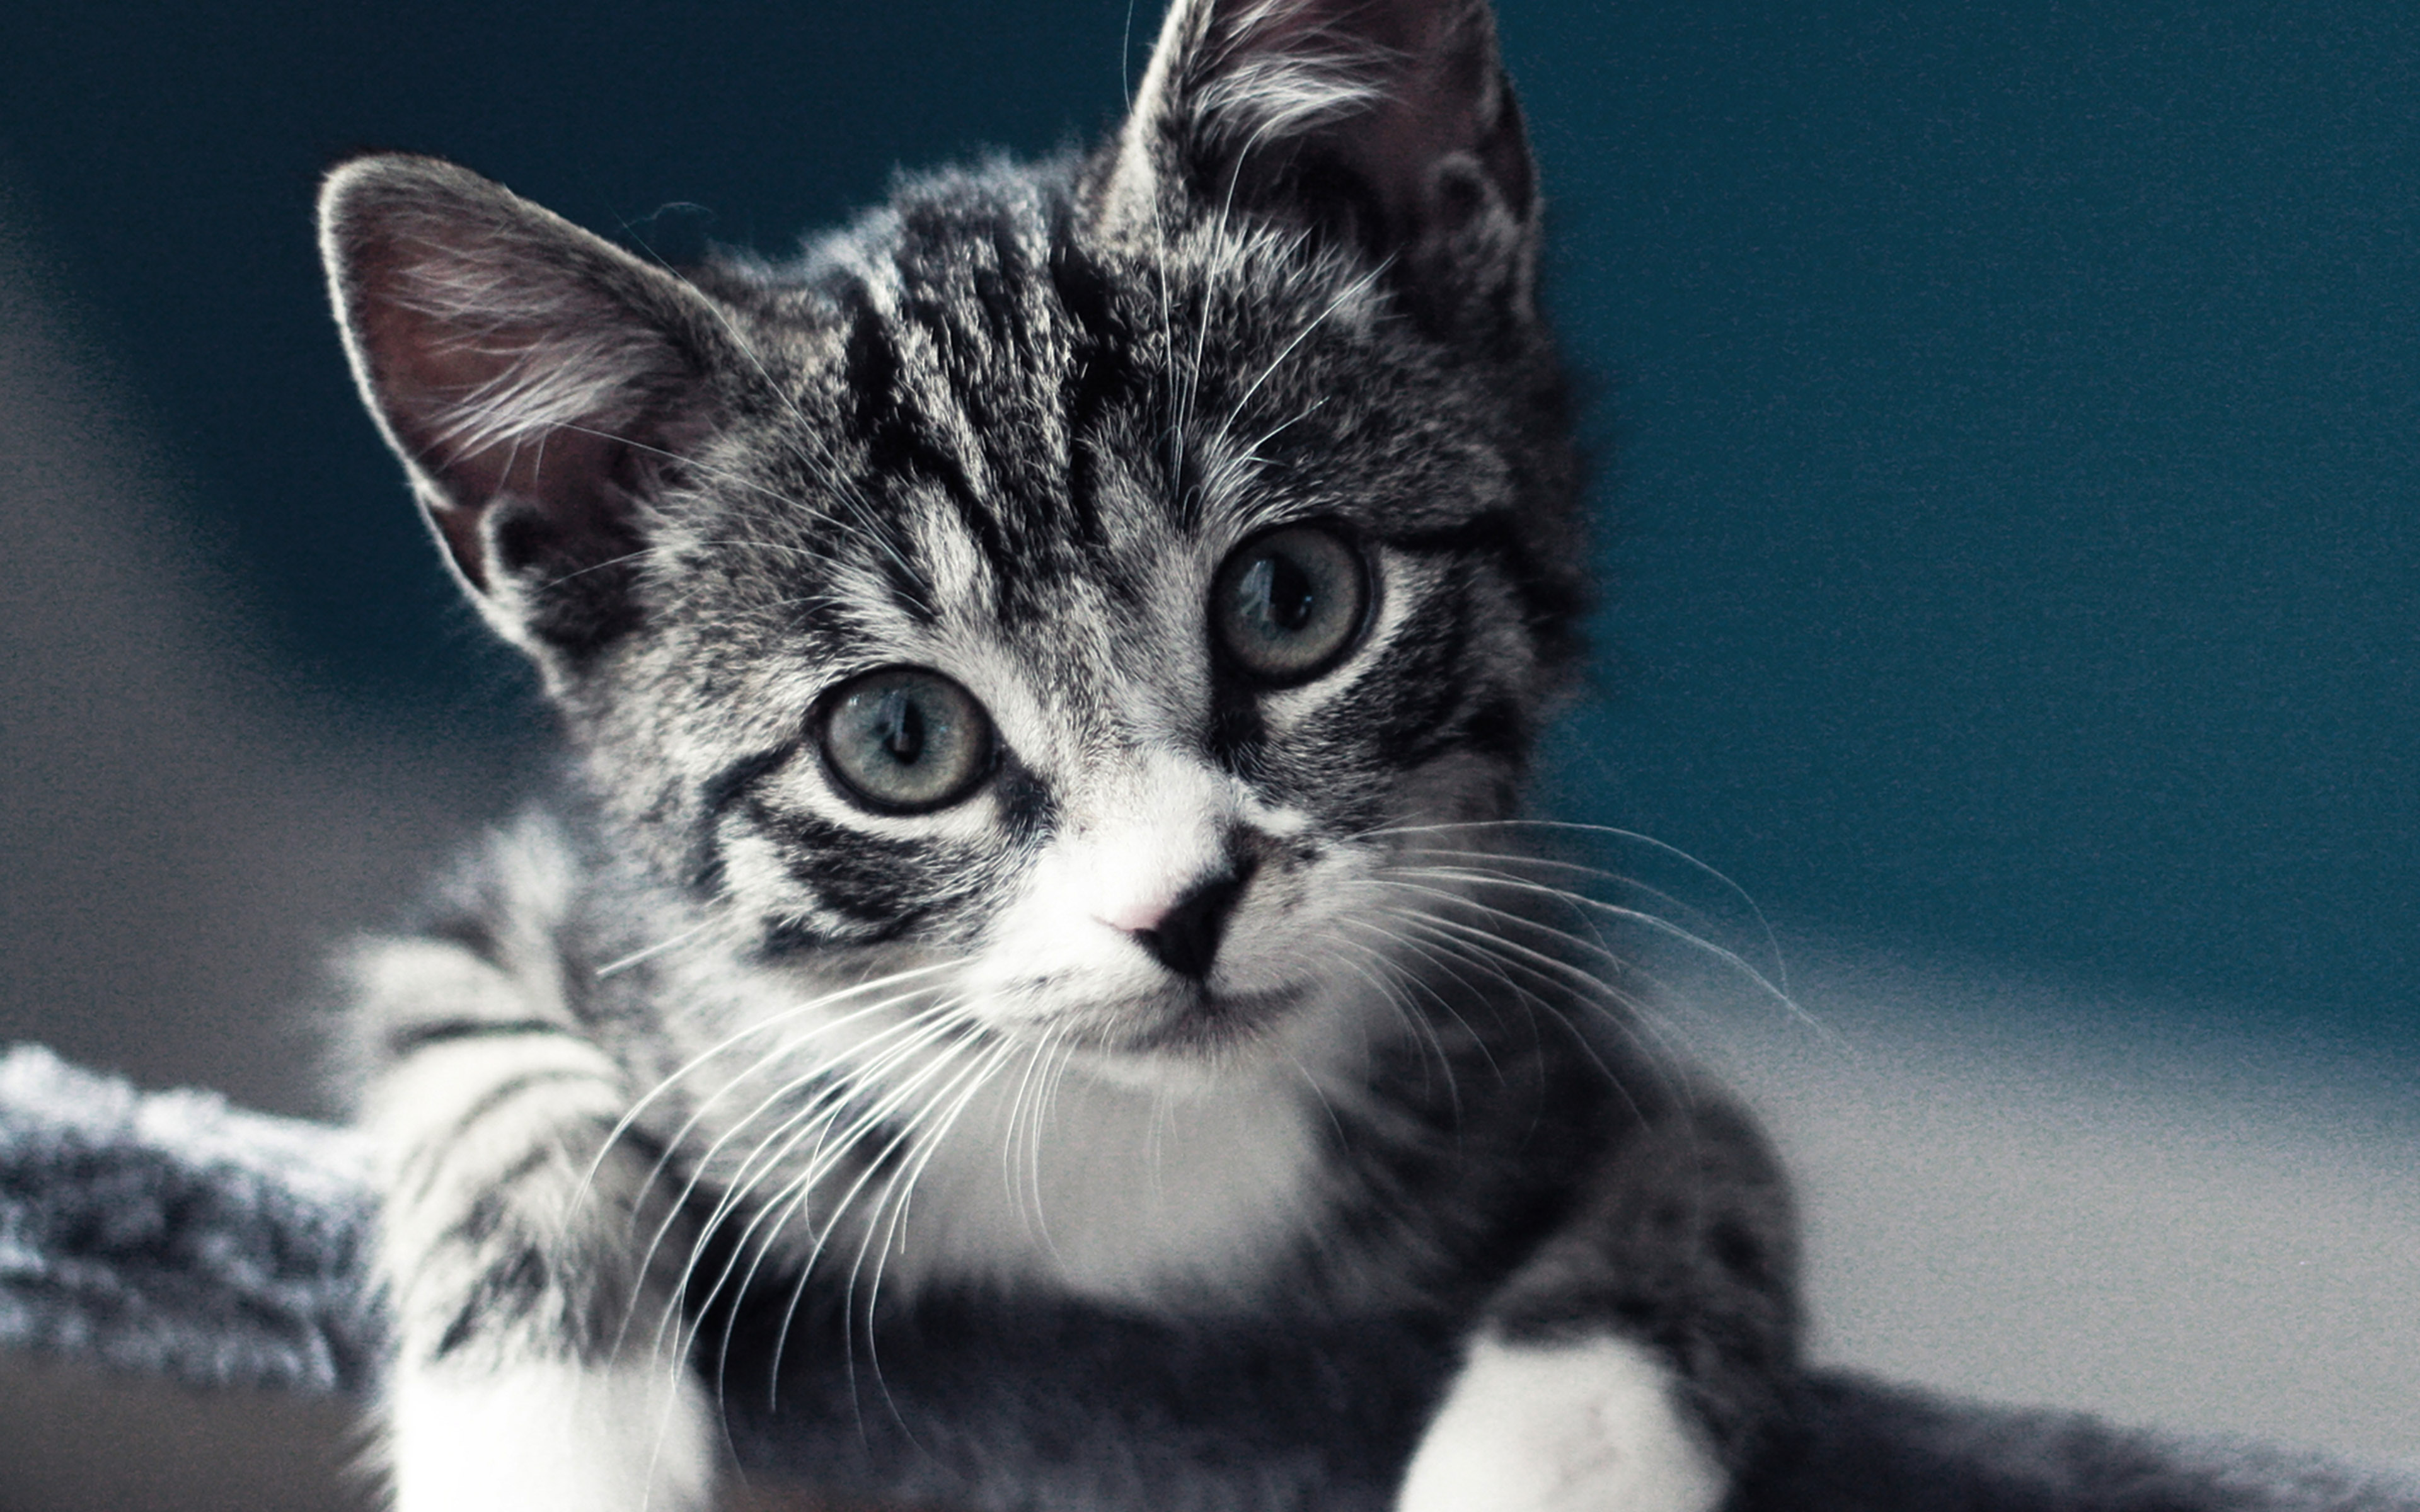 Top Wallpaper Macbook Cat - papers  HD_895677.jpg